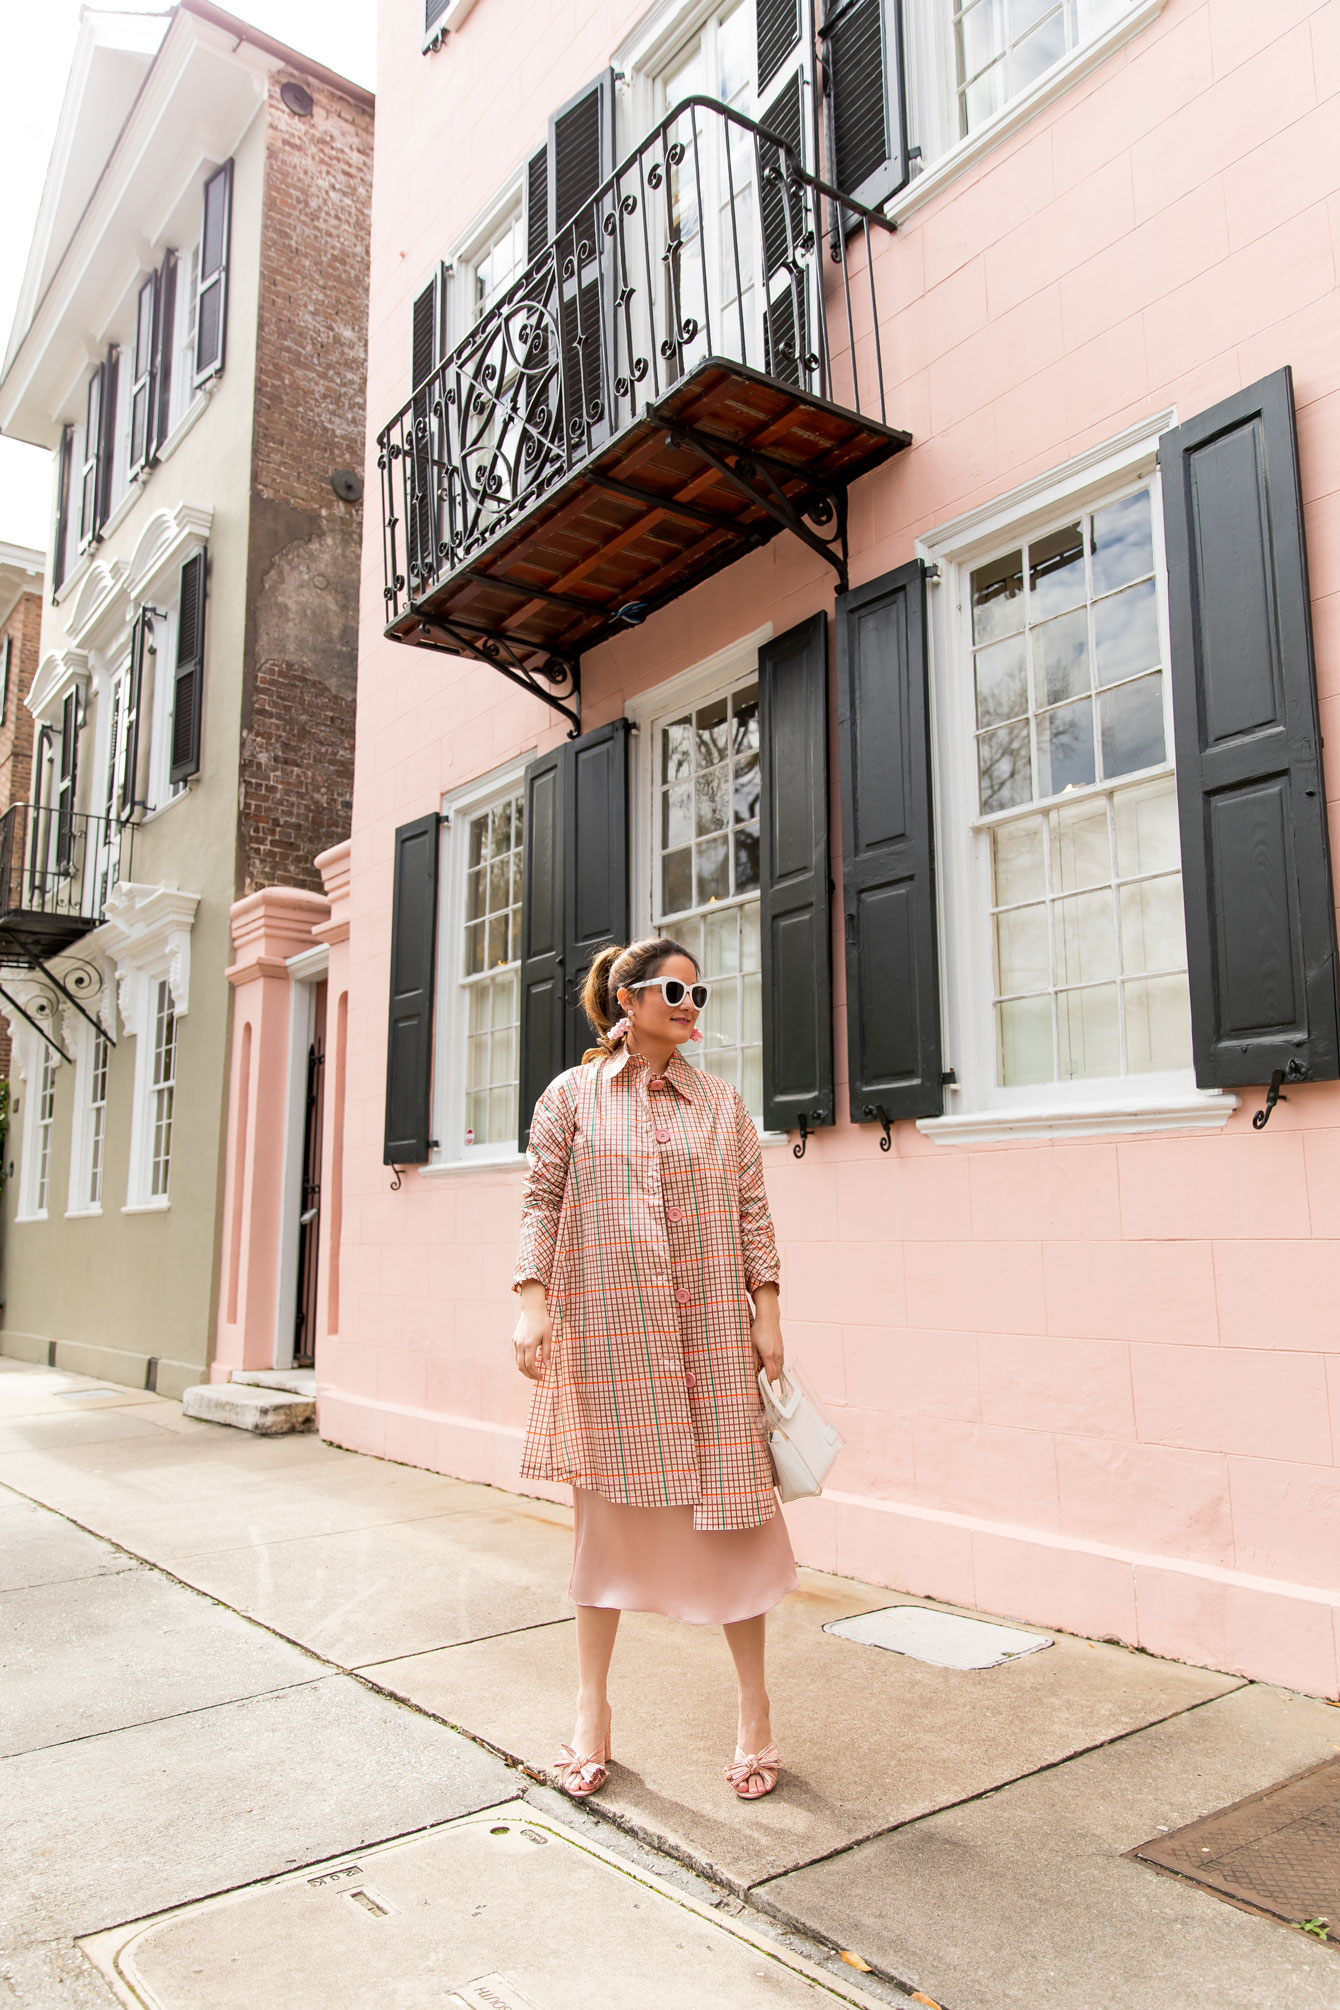 Charleston Pink Homes